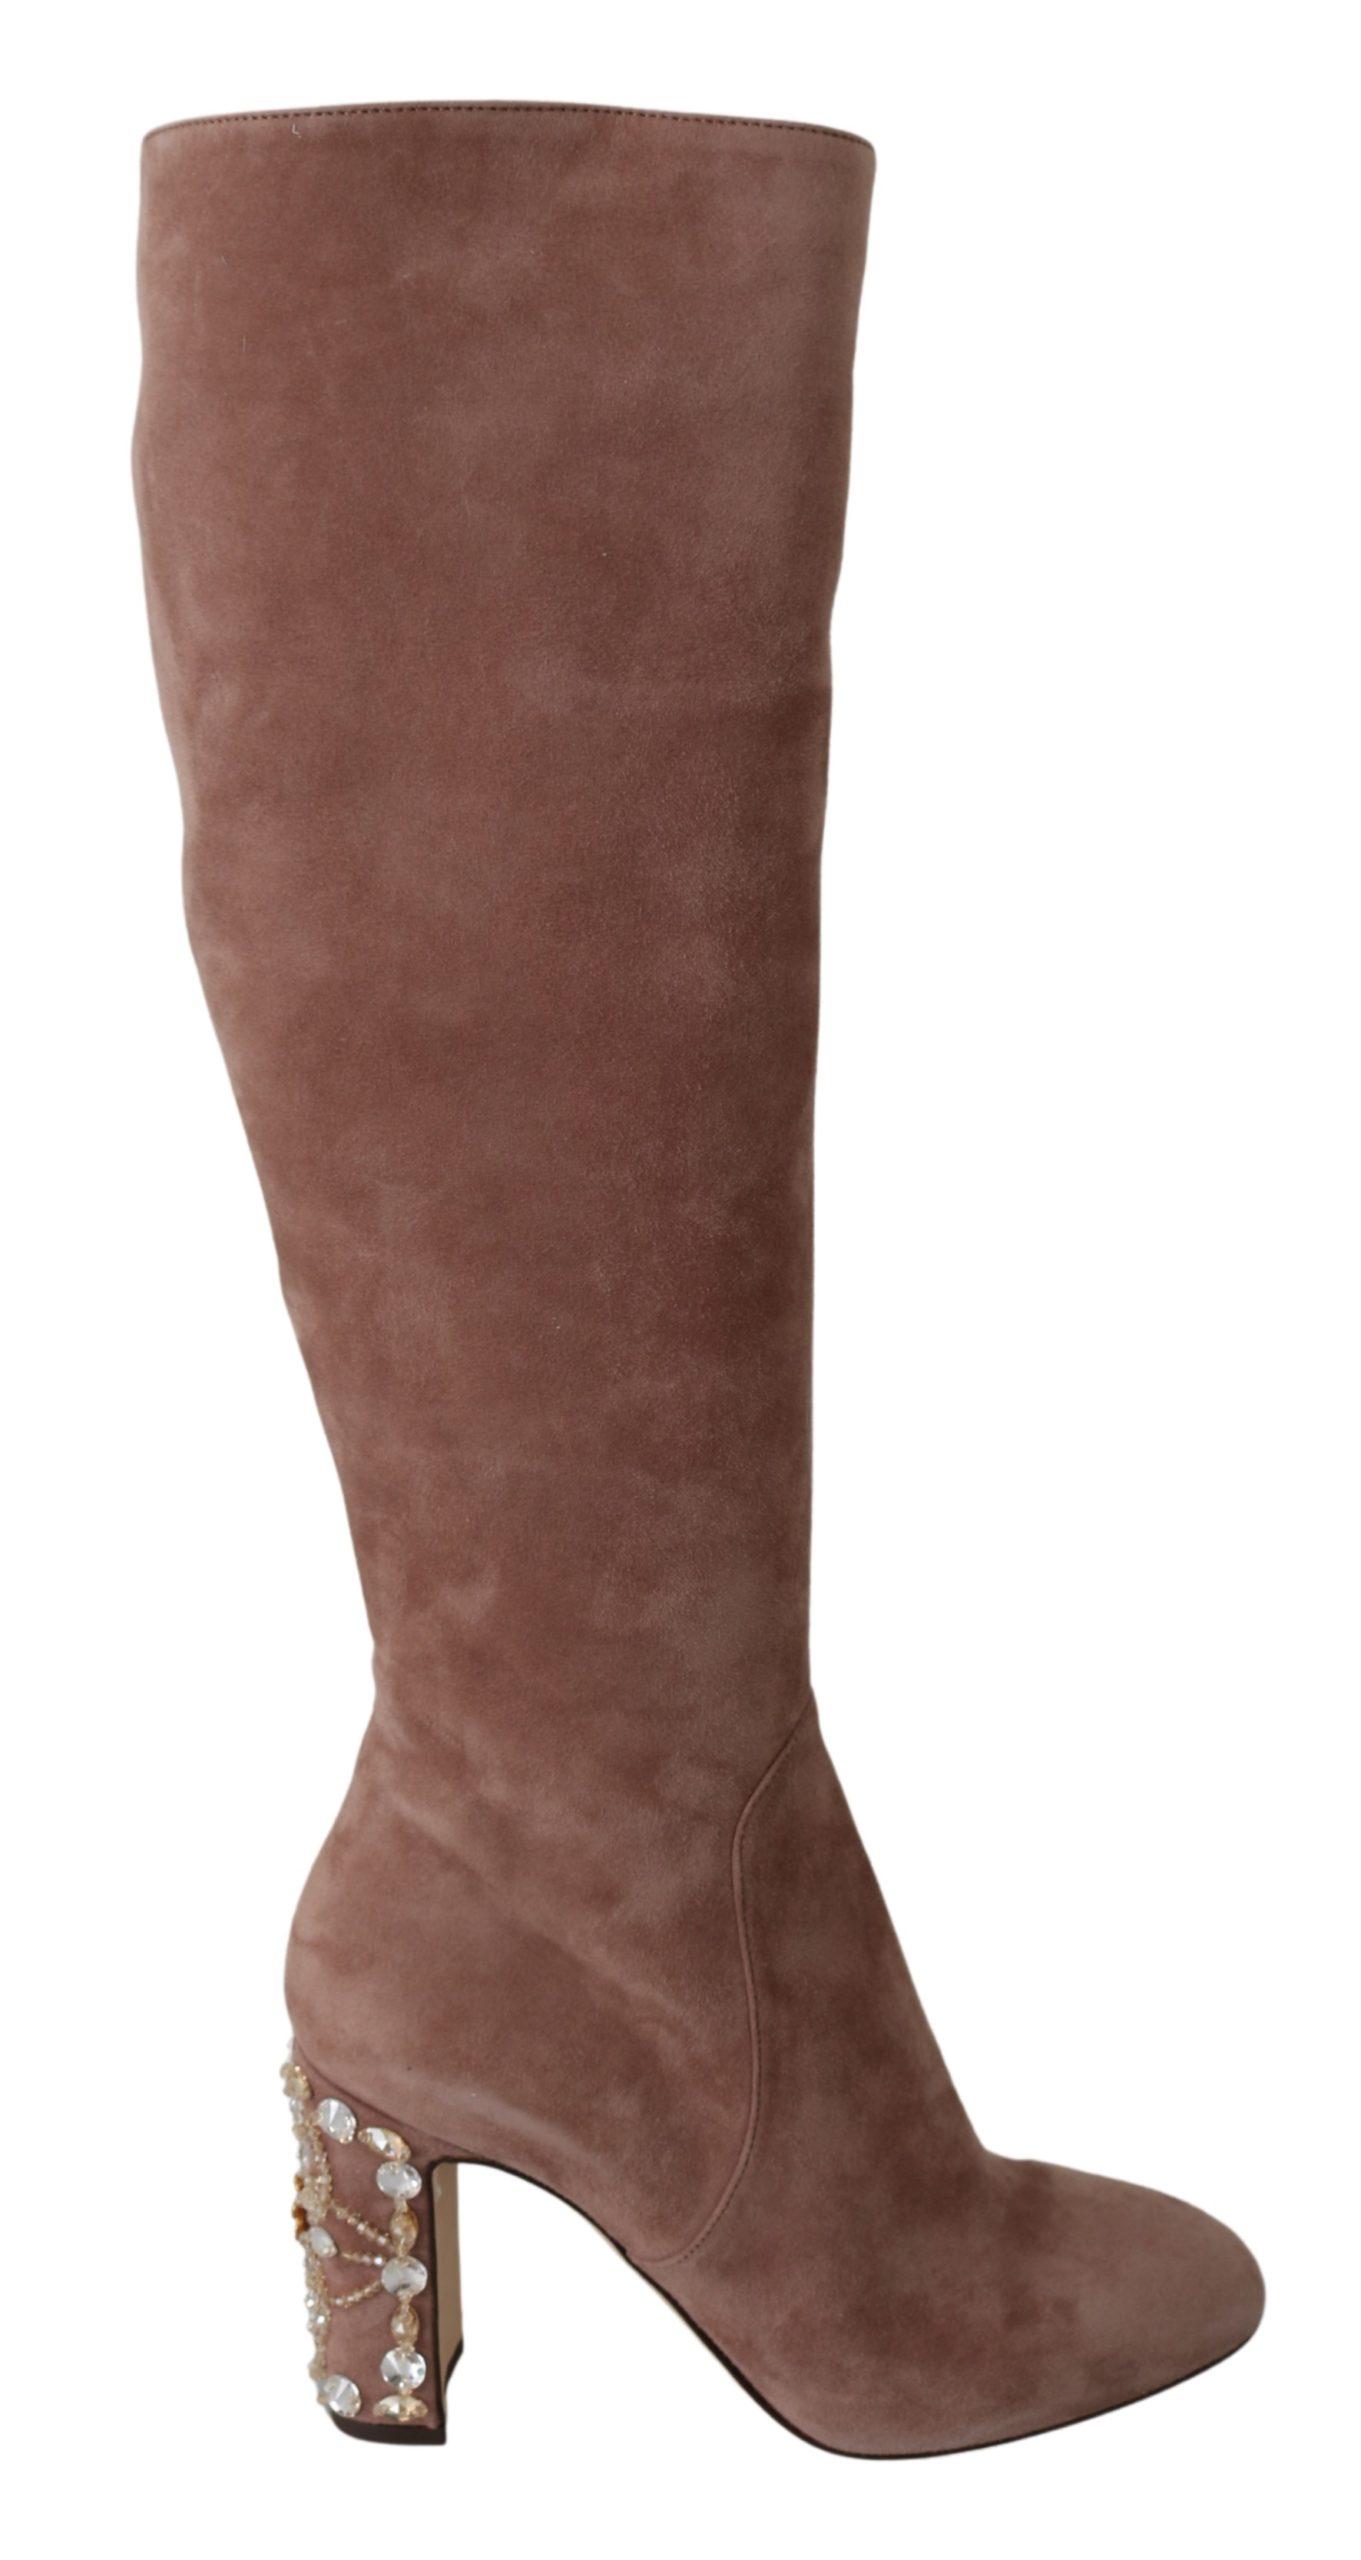 Dolce & Gabbana Women's Suede Leather Crystal Boots Beige LA6697 - EU39/US8.5